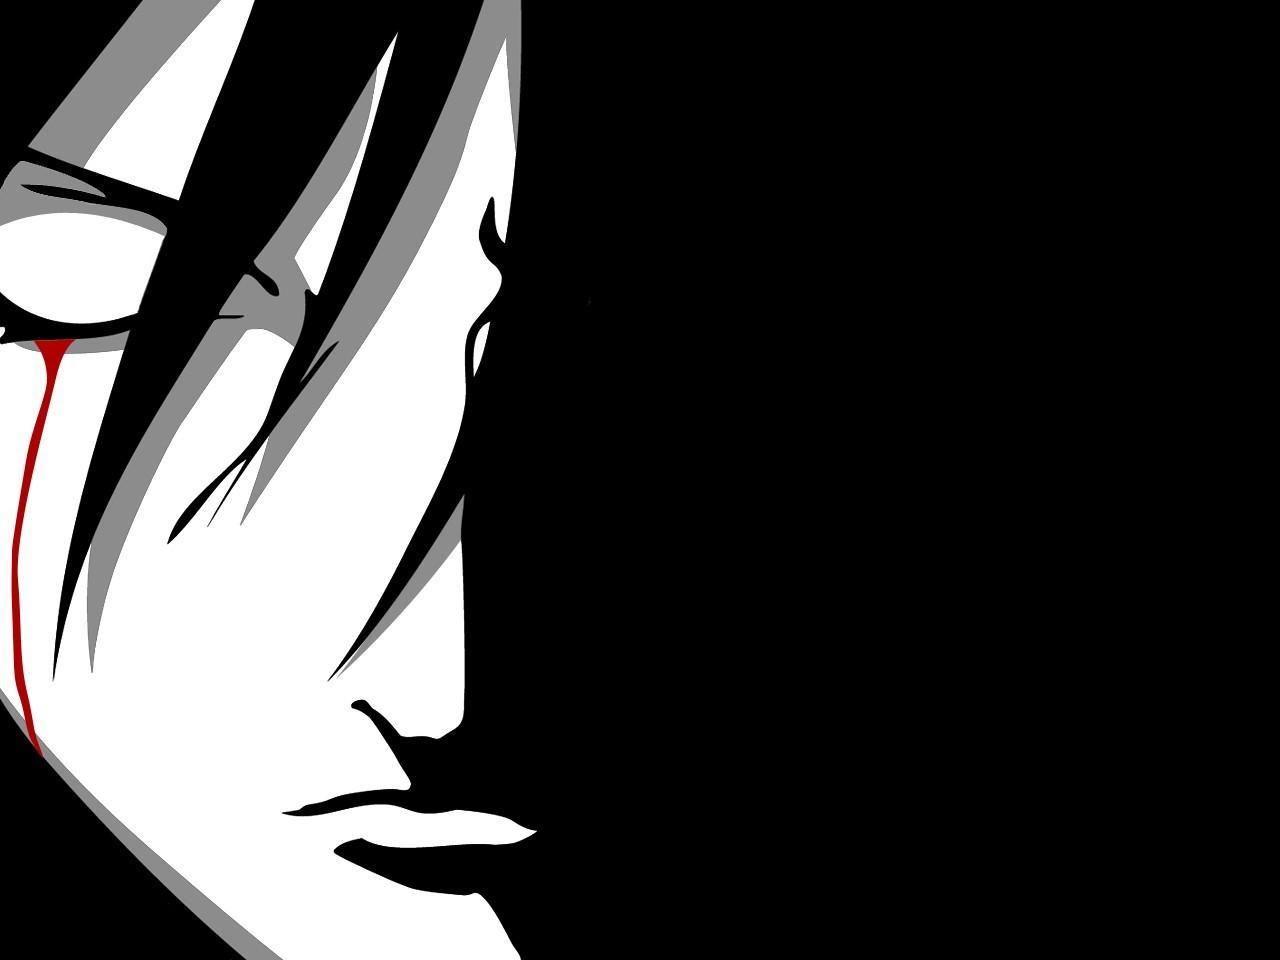 Naruto Shippuden Wallpaper Hd 1080p Wallpaper Closed Eyes Cartoon Naruto Shippuuden